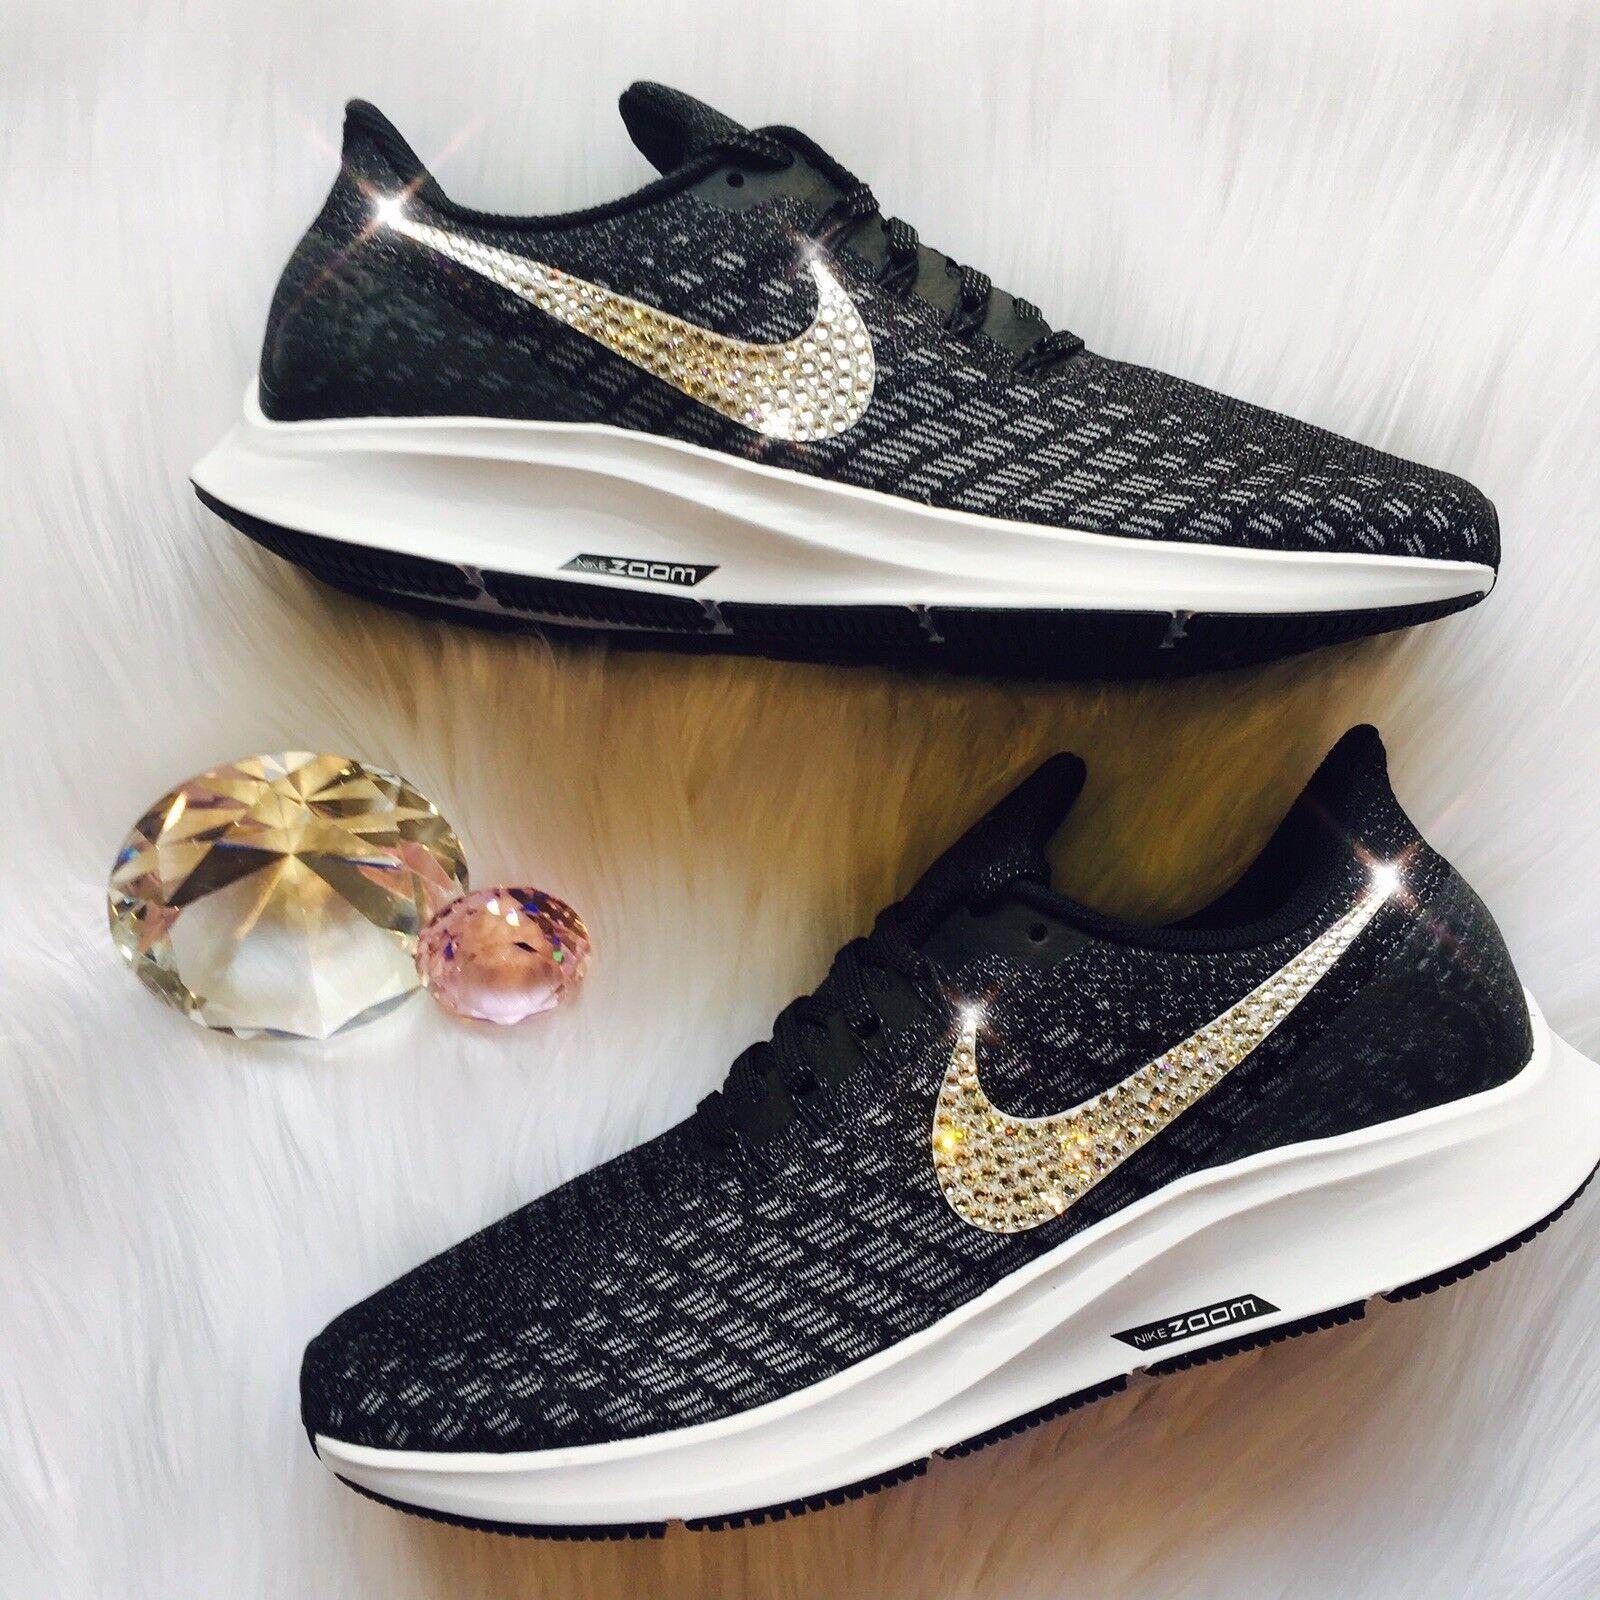 Bling Nike Air Zoom Zoom Zoom Pegasus 35 Donna  scarpe w  Swarovski Crystal Swoosh - nero b6c1c9